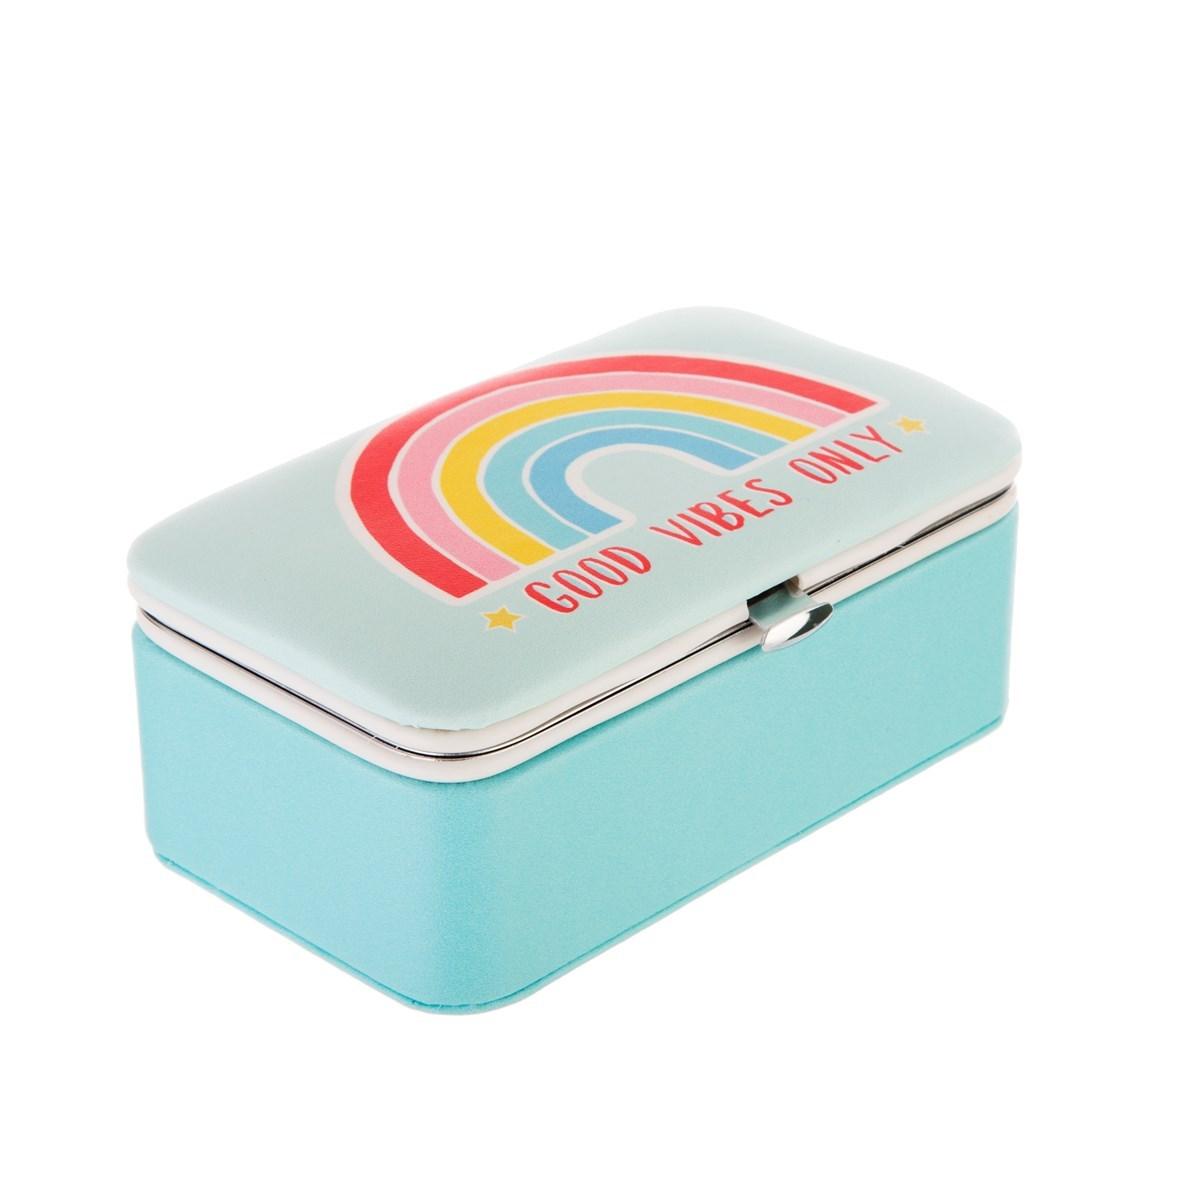 Chasing Rainbows Mini Travel Jewellery Box